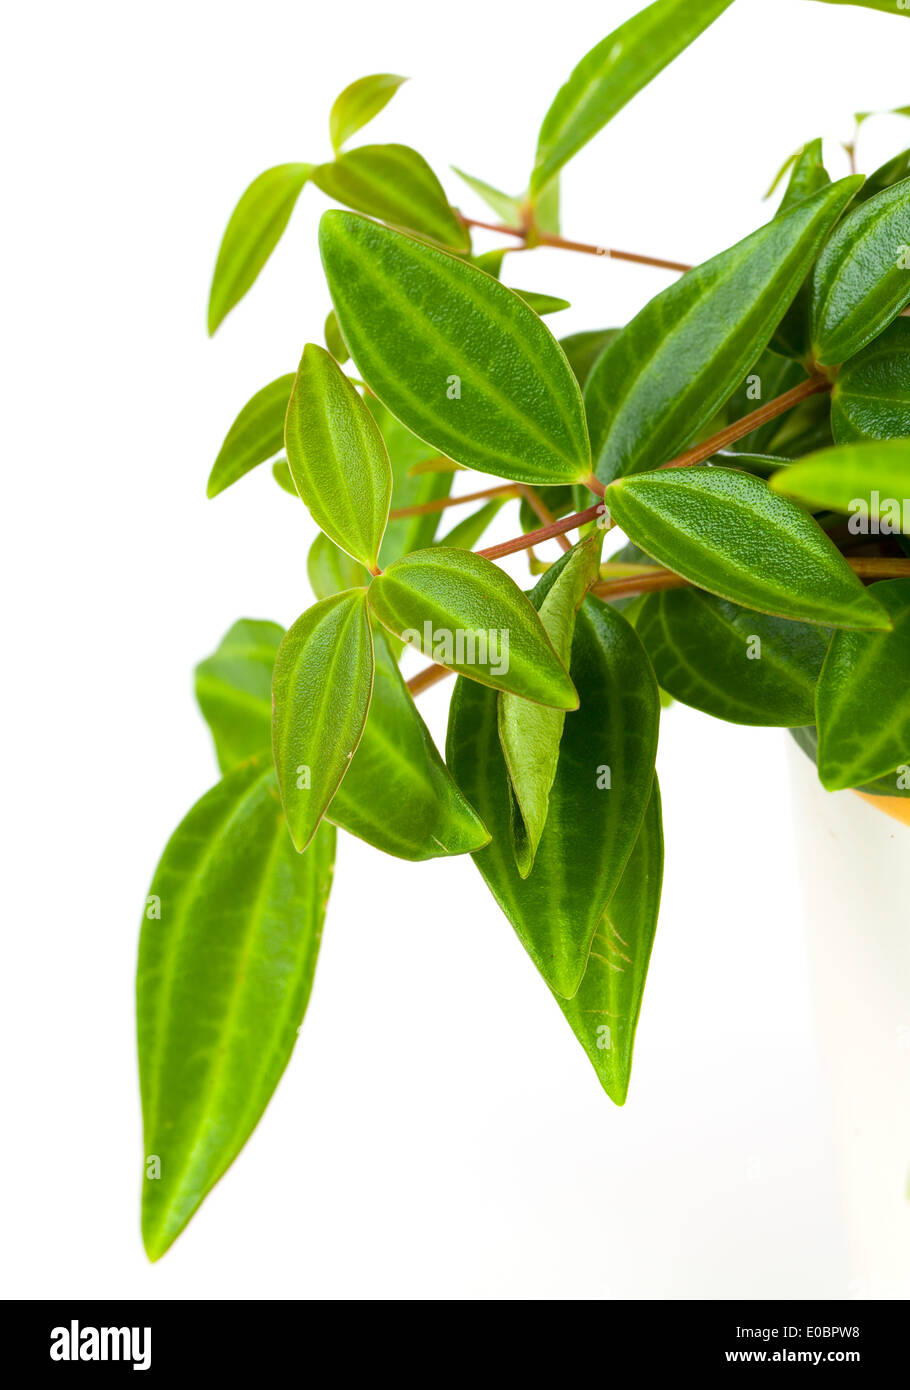 Green Leaf Of Tradescantia Pot Plant Stock Photo Royalty